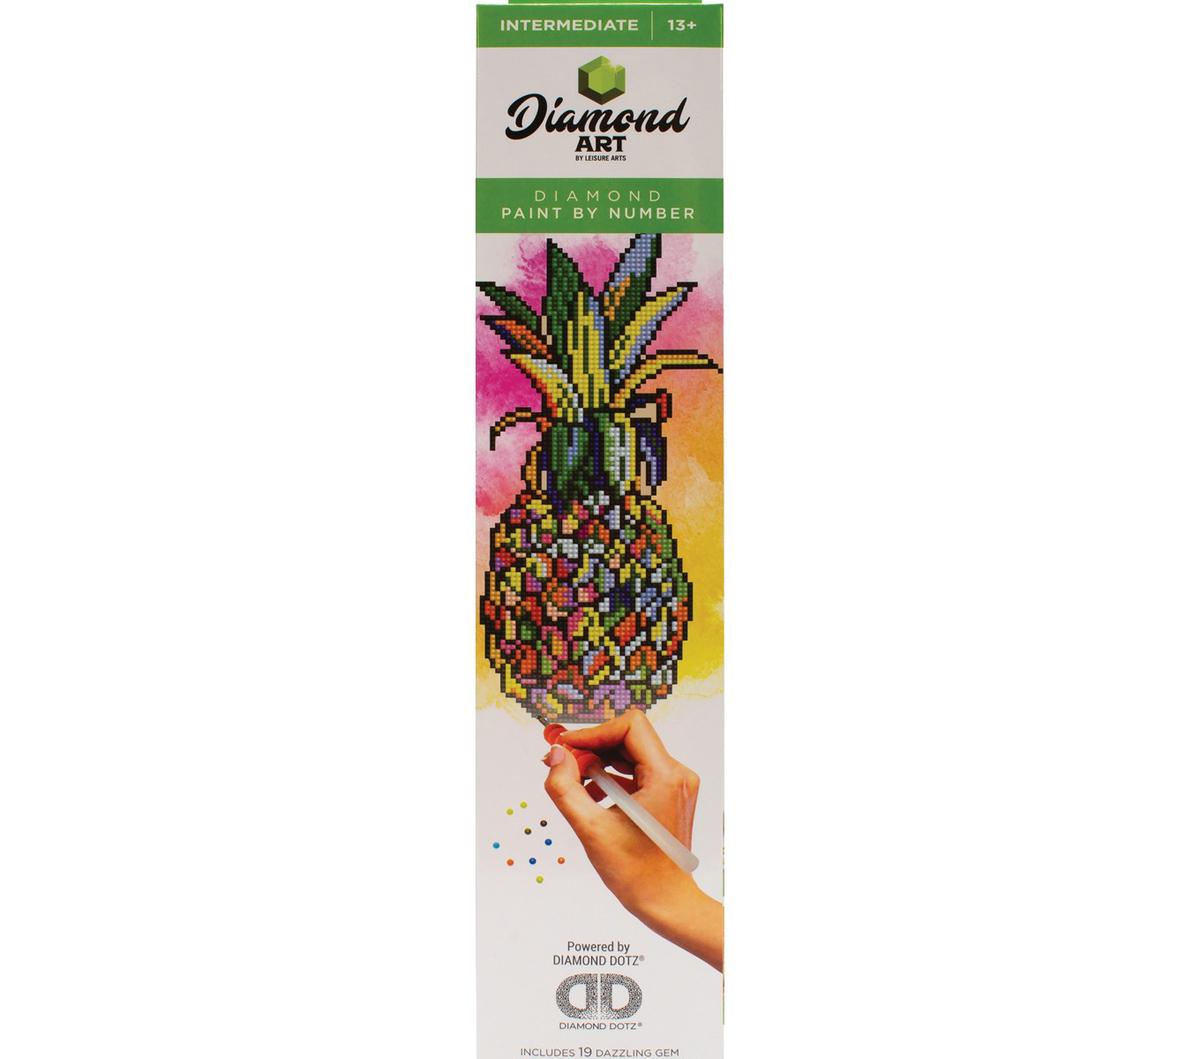 Leisure Arts Diamond Art Intermediate Kit 12 X12 Pineapple